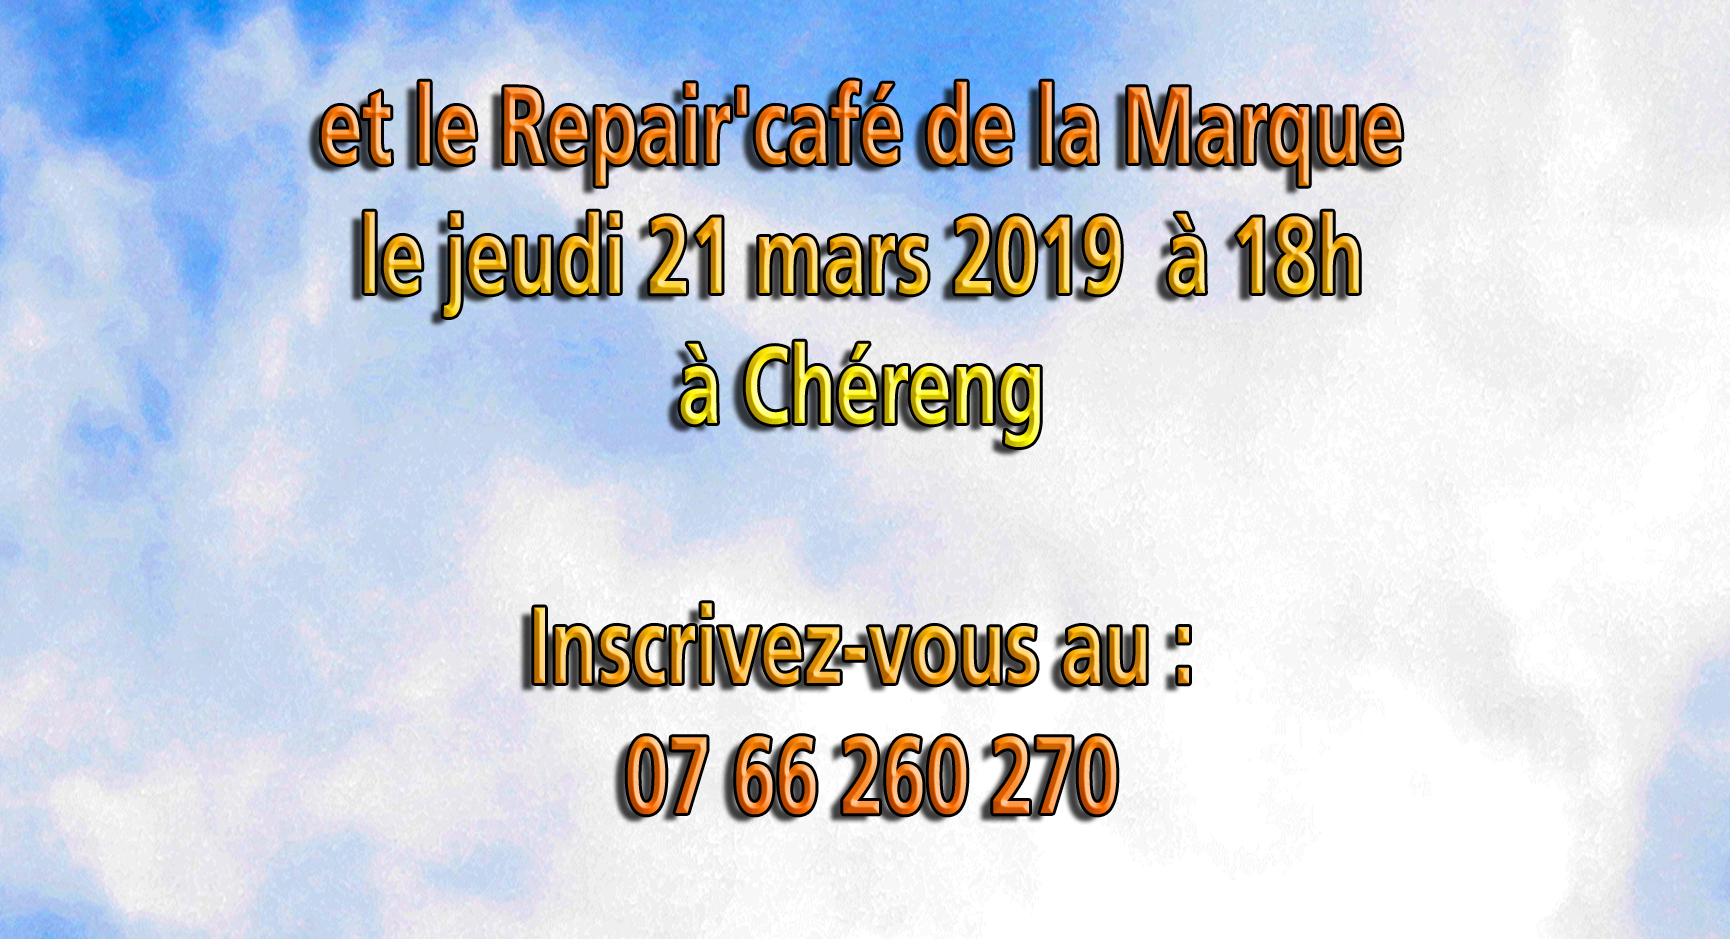 Repair marque che reng mars 2019